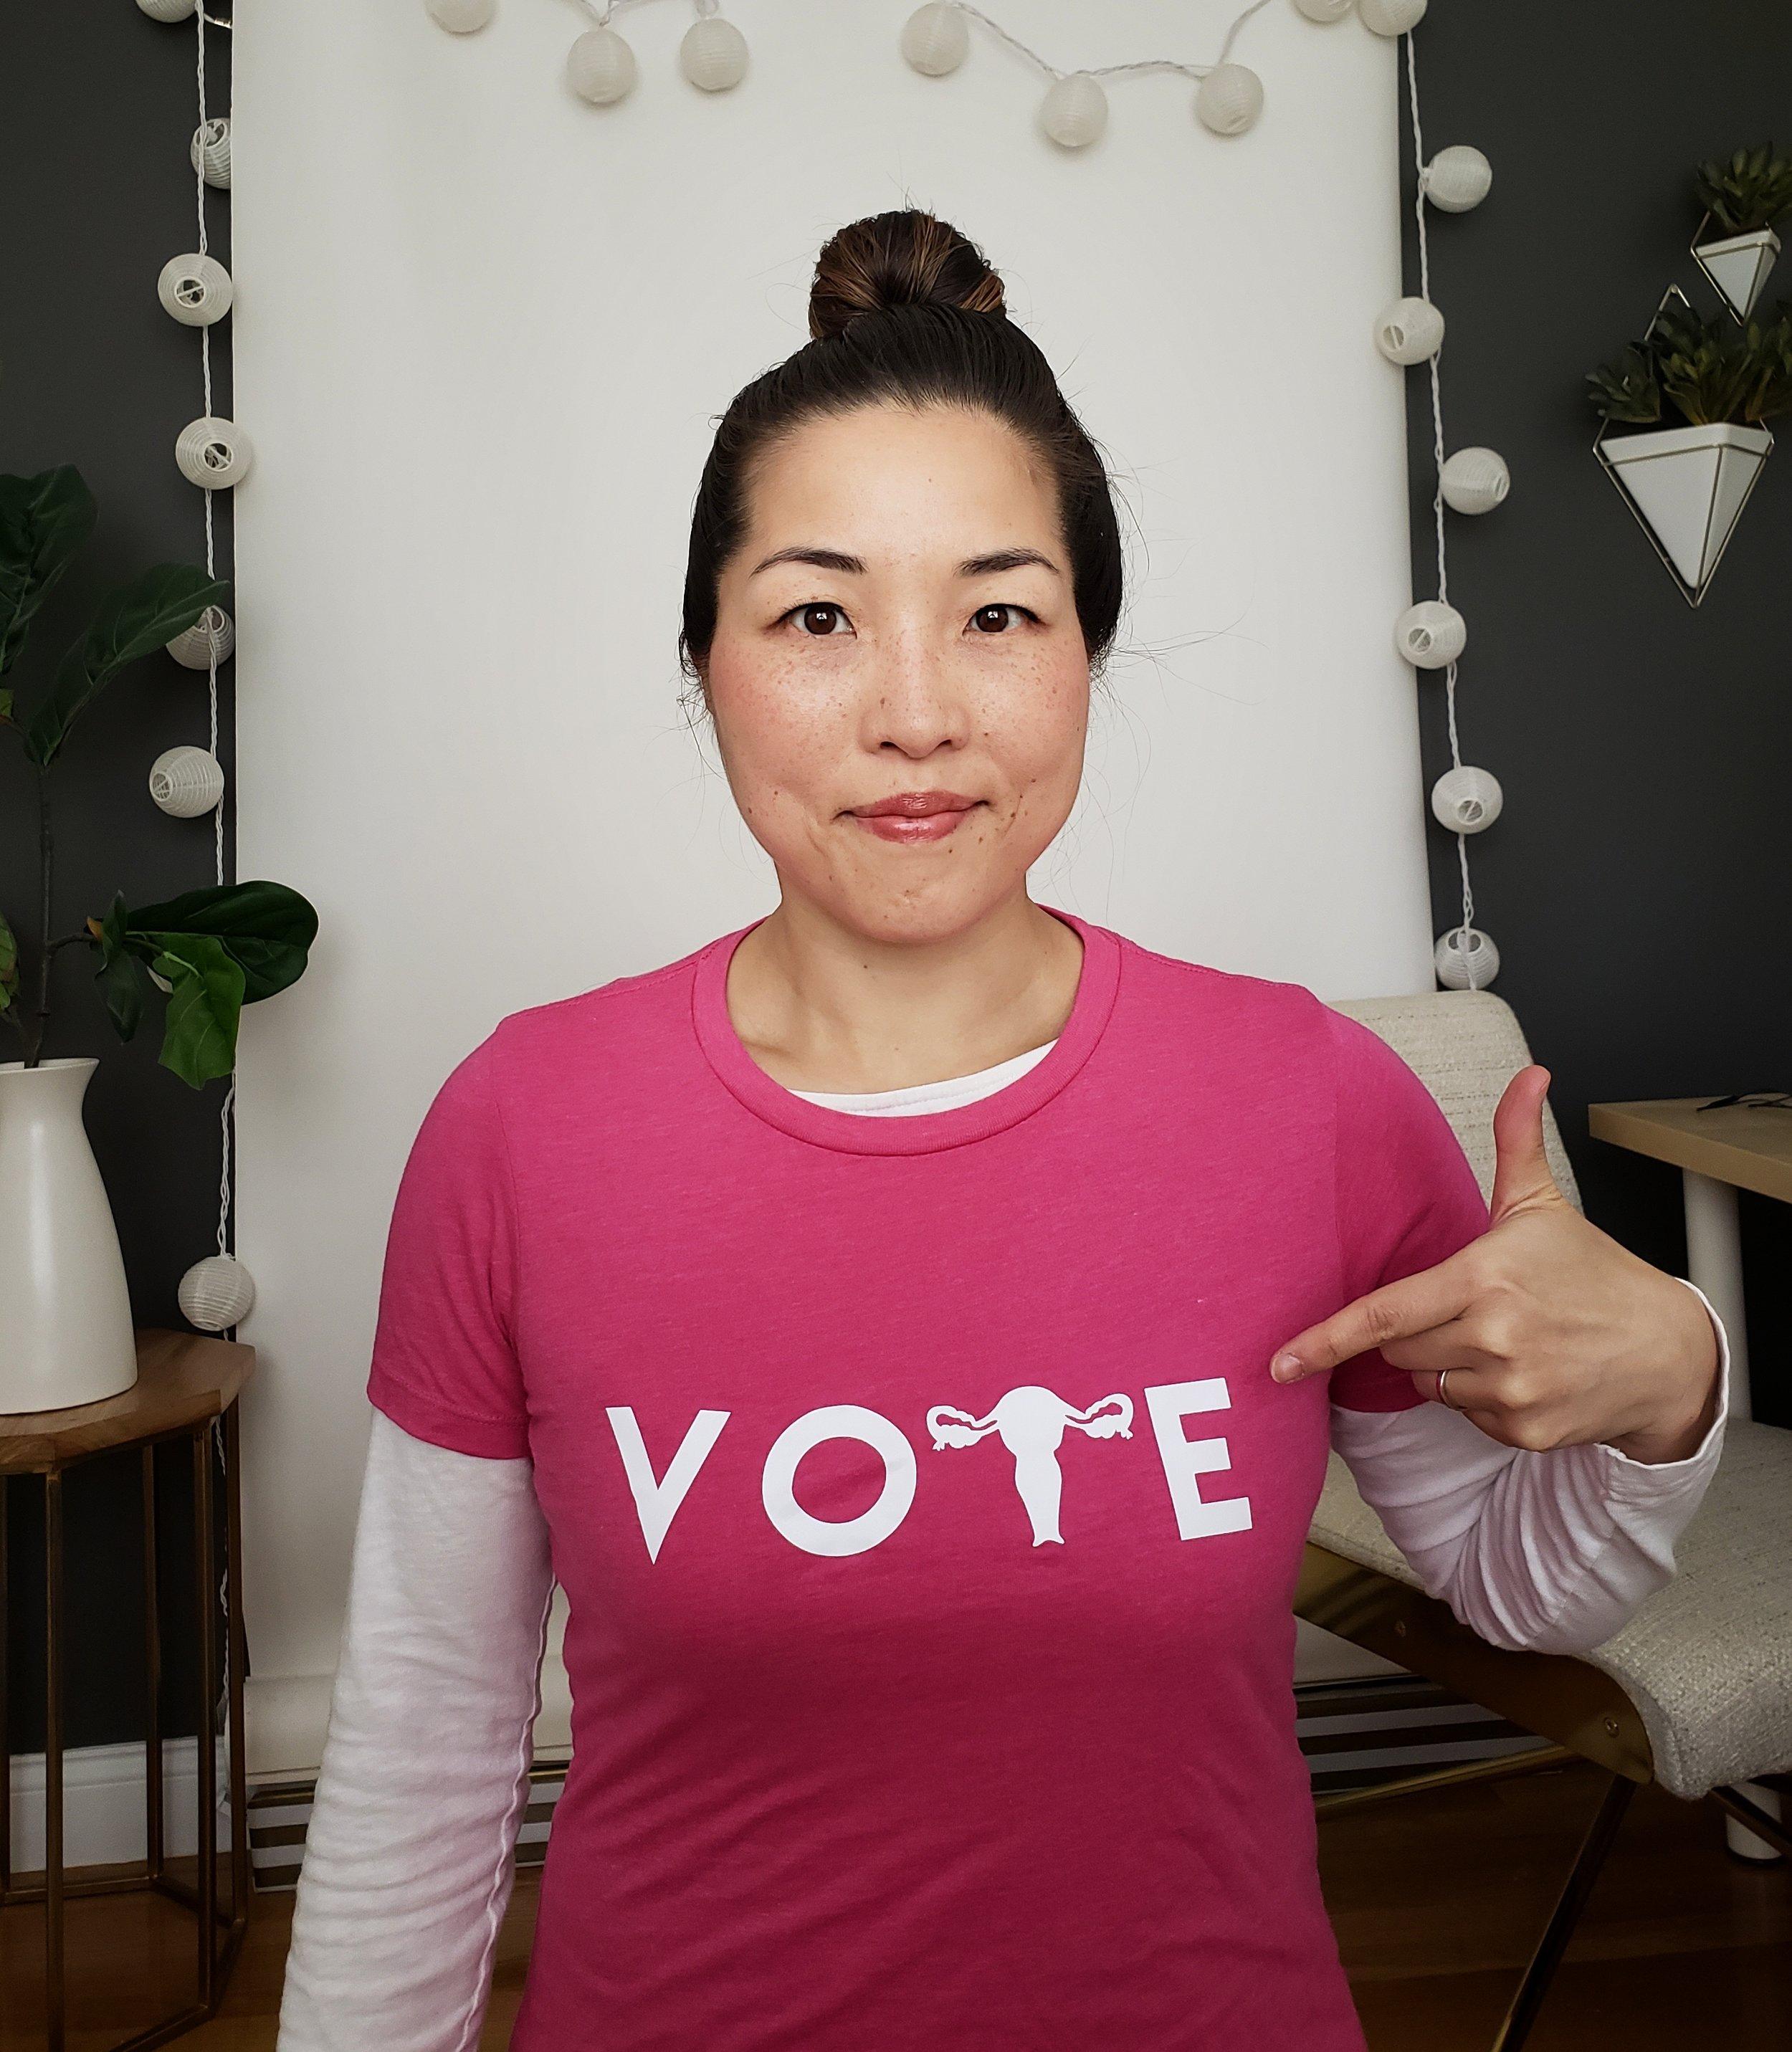 Brave New World Designs Vote Reproductive Rights t-shirt; image via Christine Koh